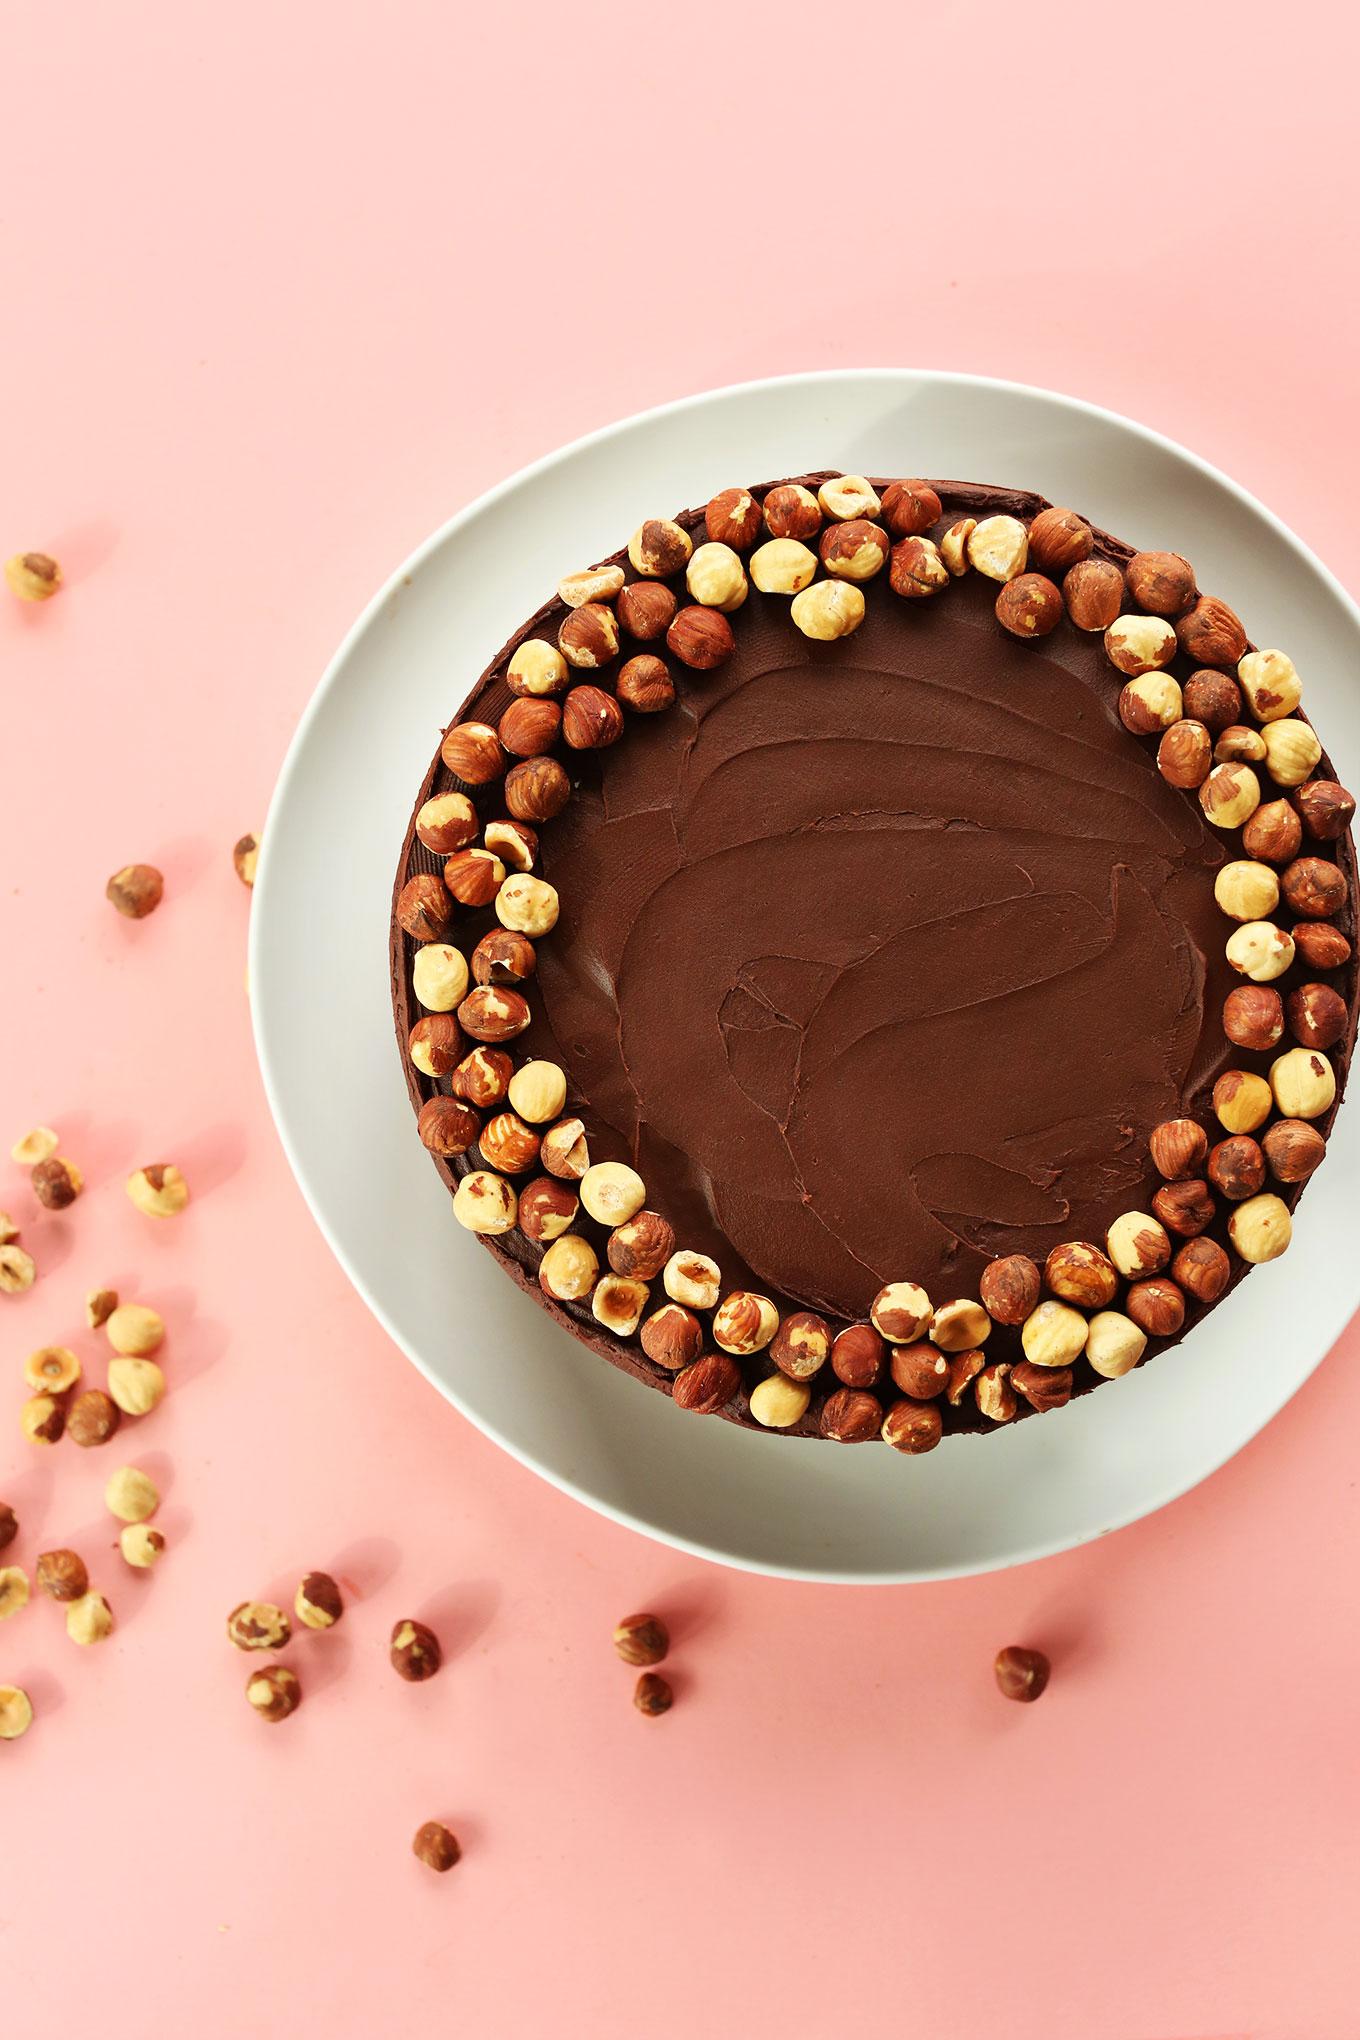 Our Vegan GF Chocolate Hazelnut Cake decorated with a rim of fresh roasted hazelnuts